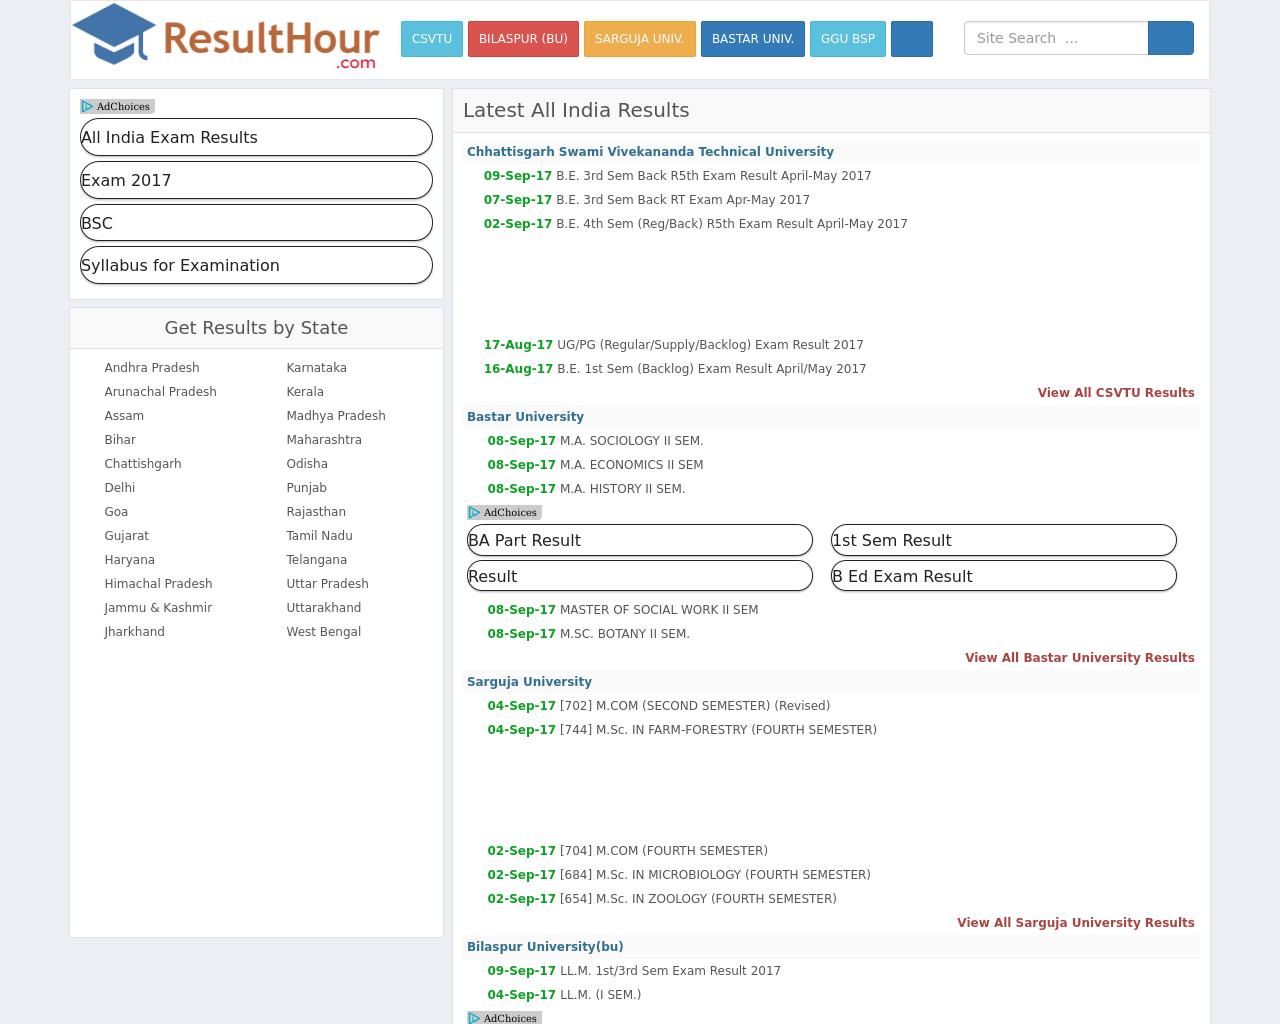 ResultHour.com-Advertising-Reviews-Pricing